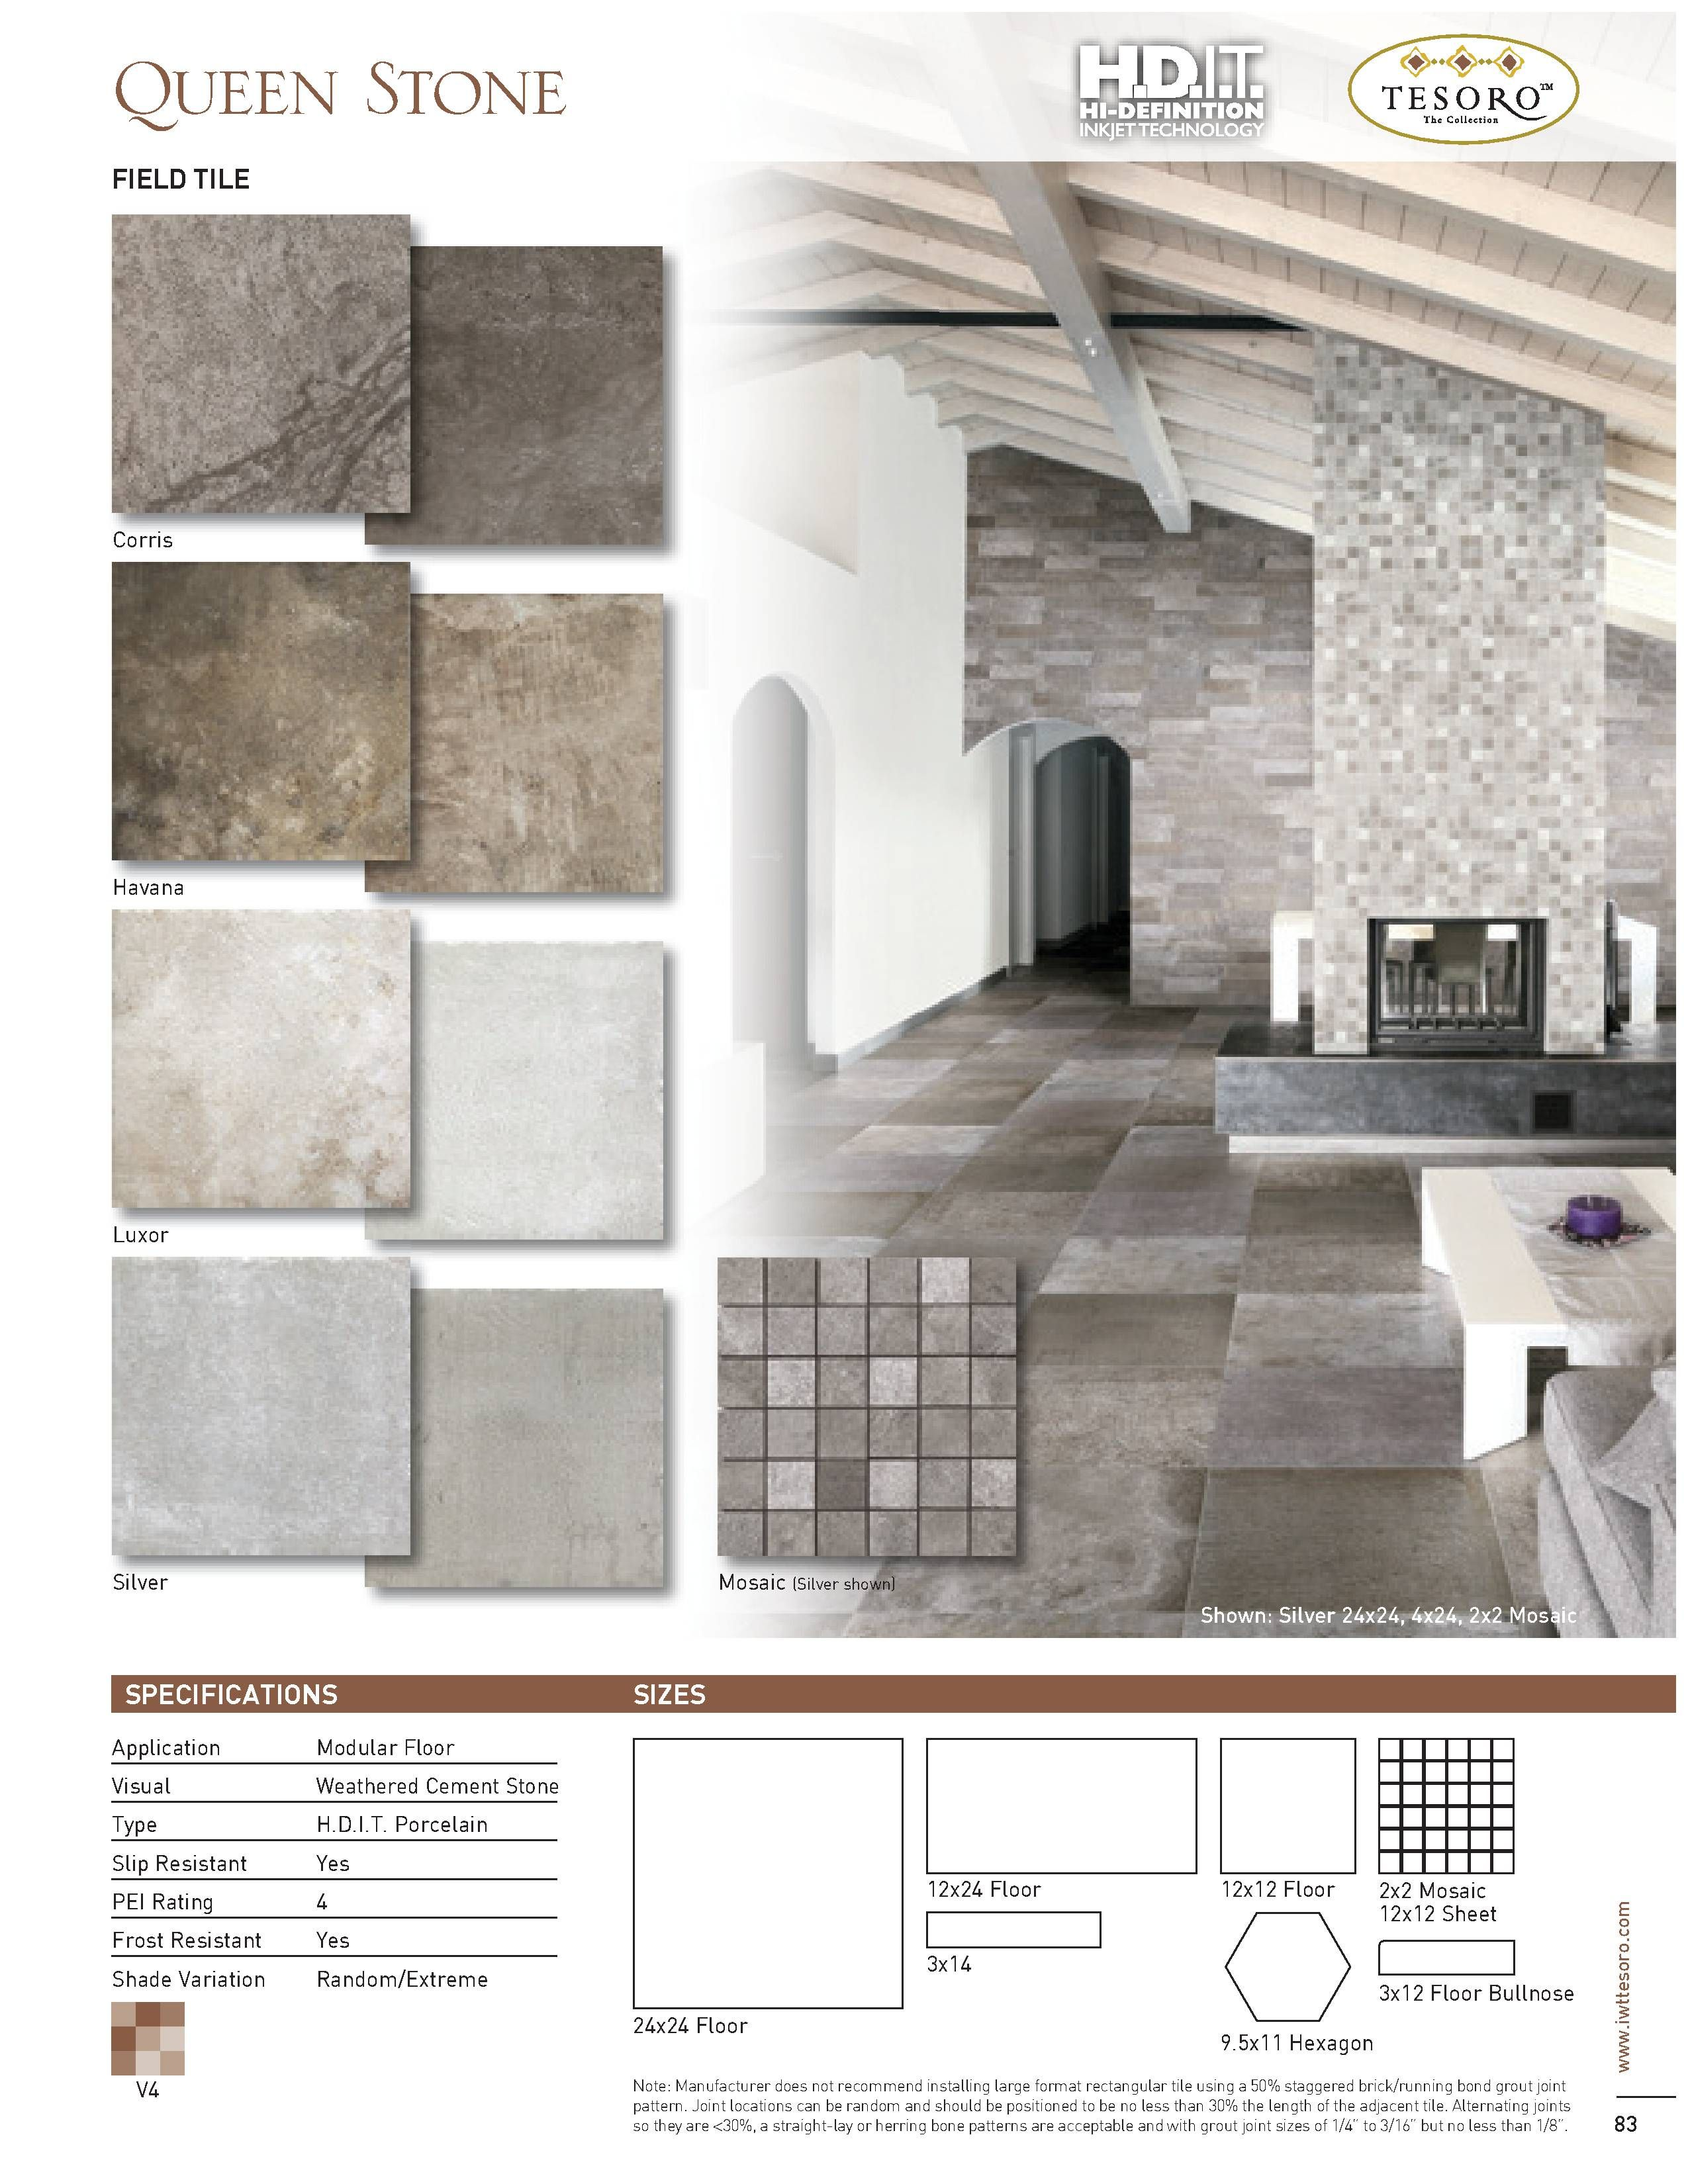 hight resolution of tesoro queen stone brochure floors tile flats mosaics tiles flooring